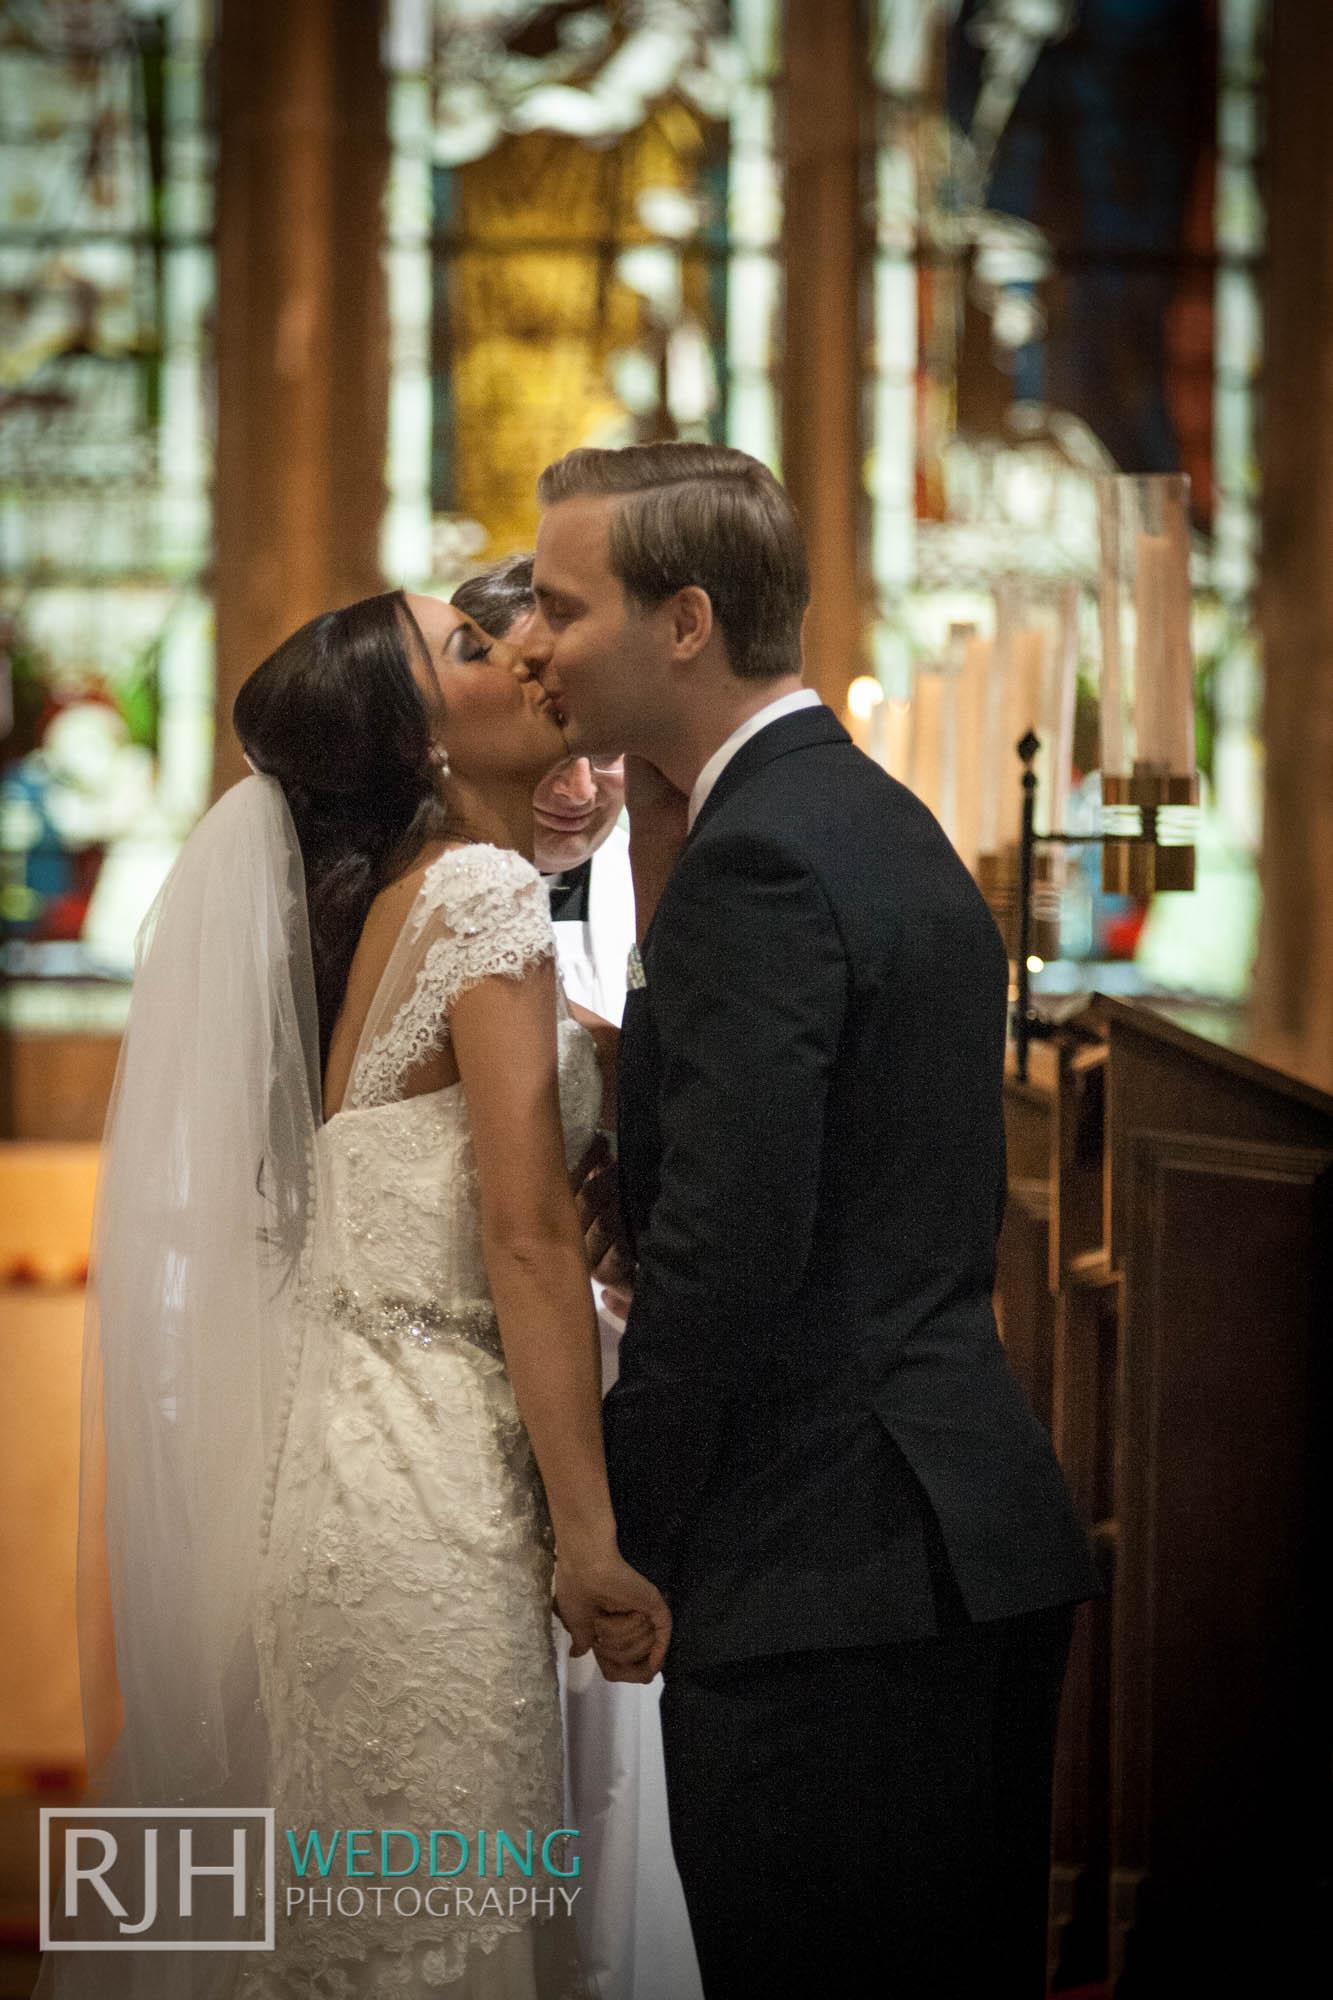 RJH Wedding Photography_Tankersley Manor Wedding_21.jpg